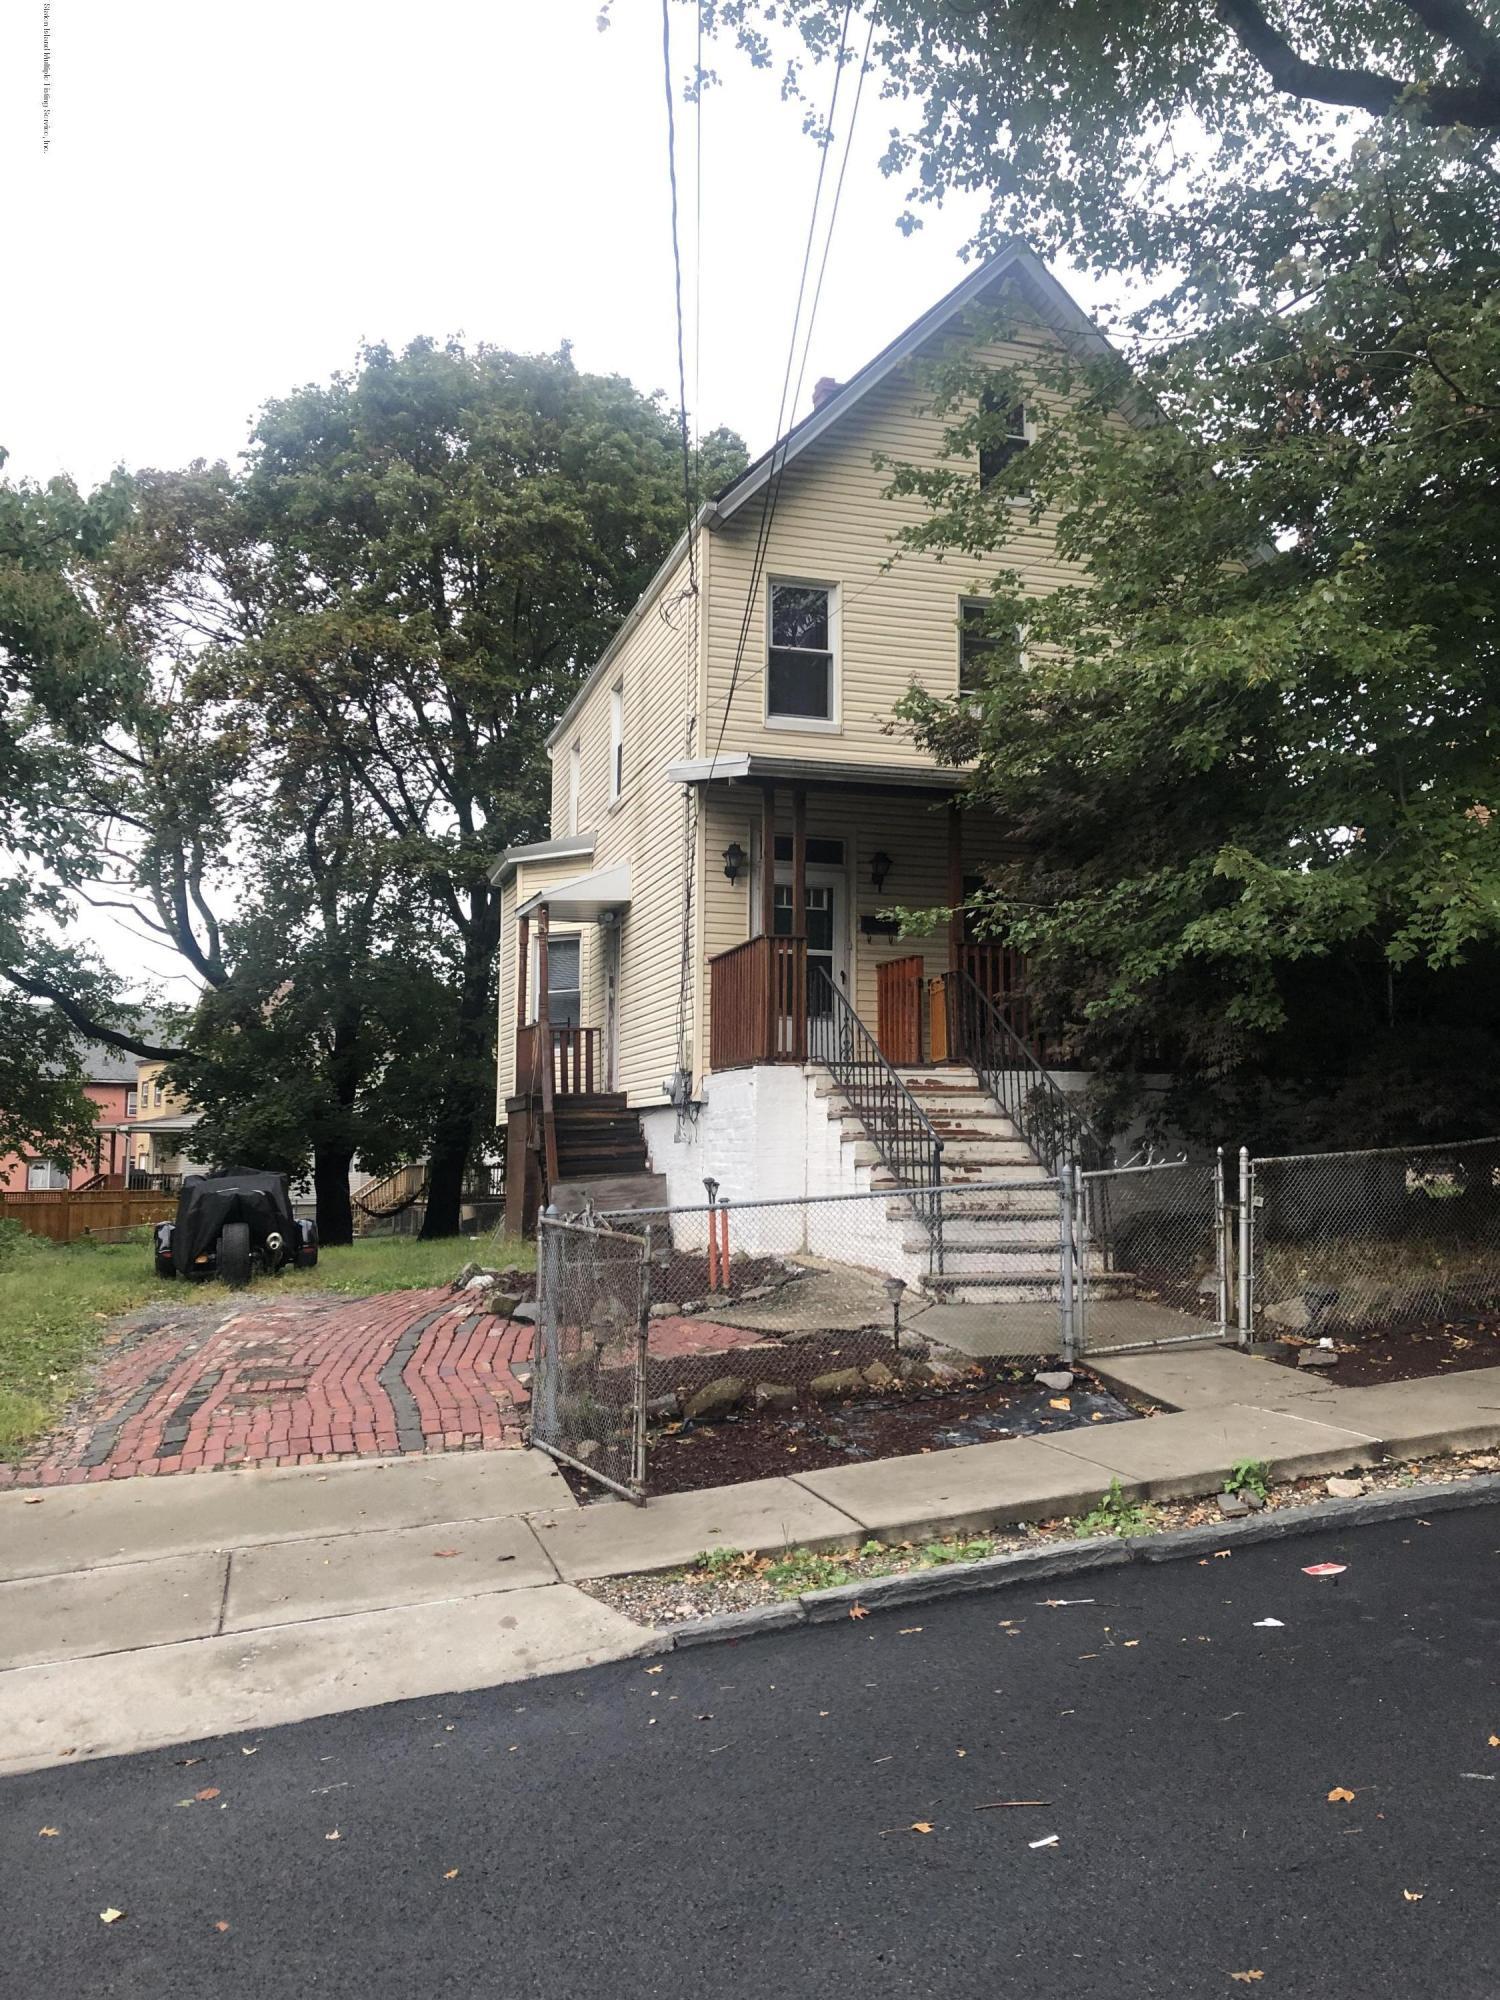 31 Layton Avenue,Staten Island,New York,10301,United States,3 Bedrooms Bedrooms,7 Rooms Rooms,3 BathroomsBathrooms,Residential,Layton,1132930